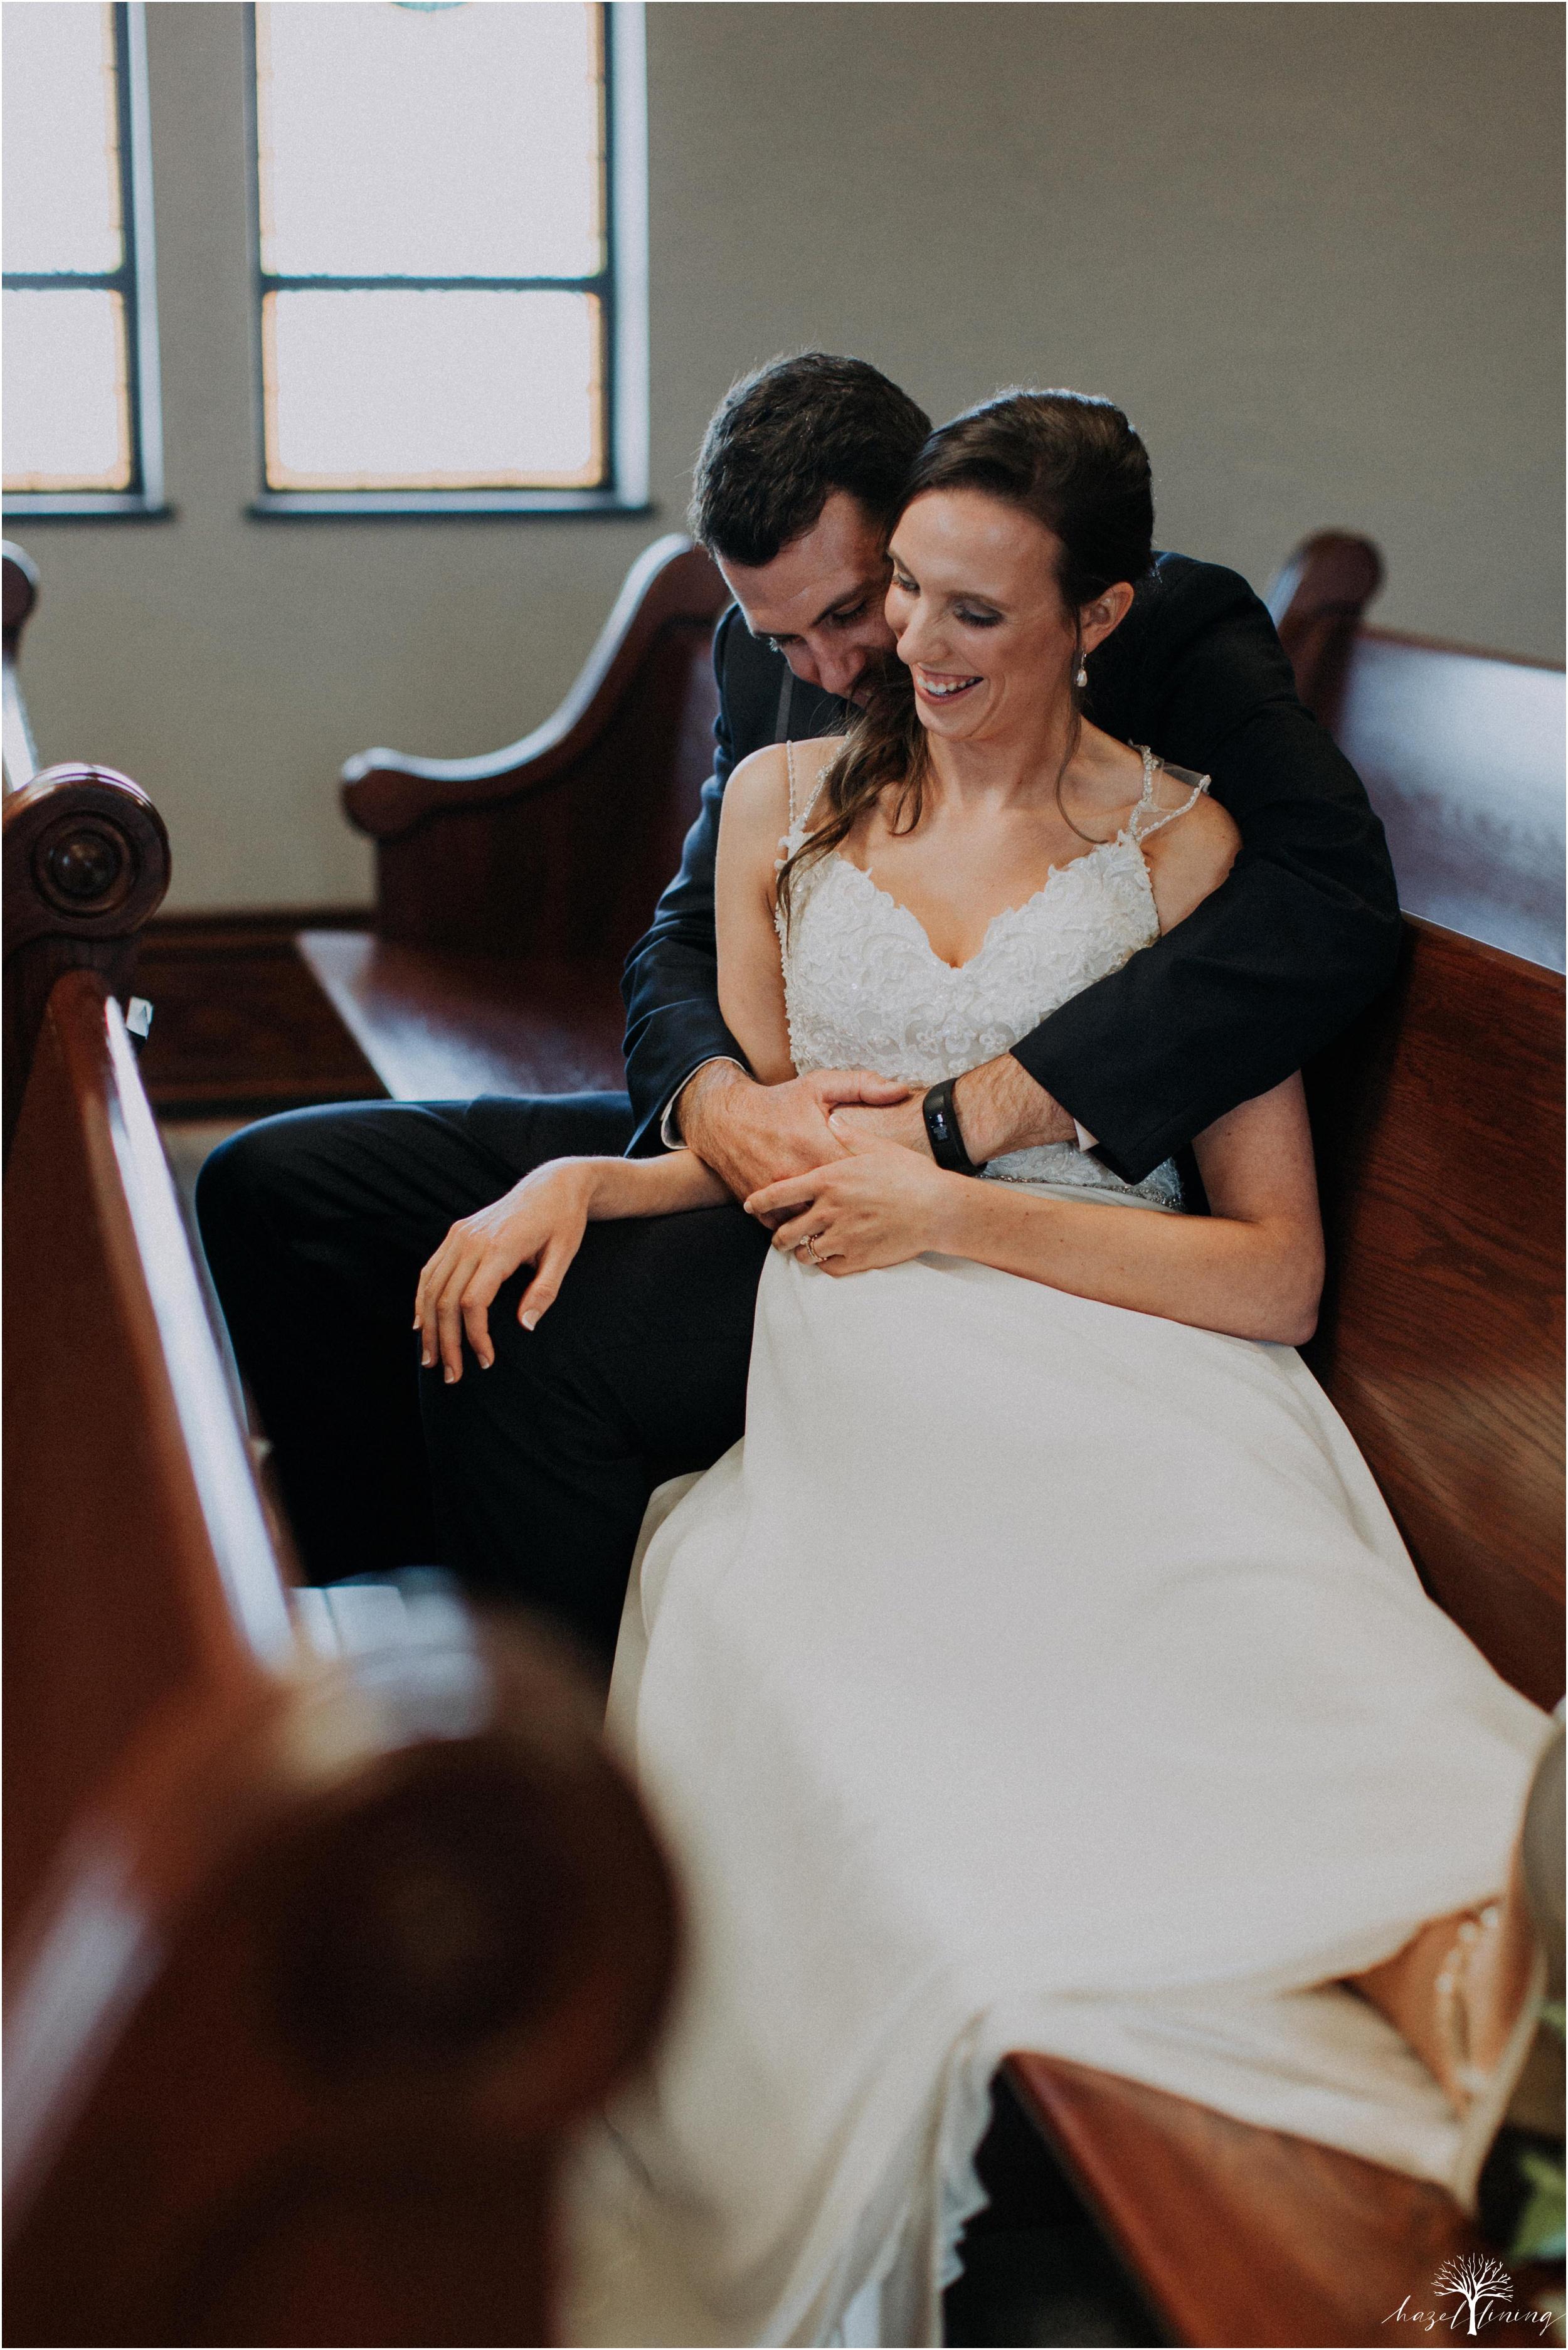 hazel-lining-travel-wedding-elopement-photography_0070.jpg